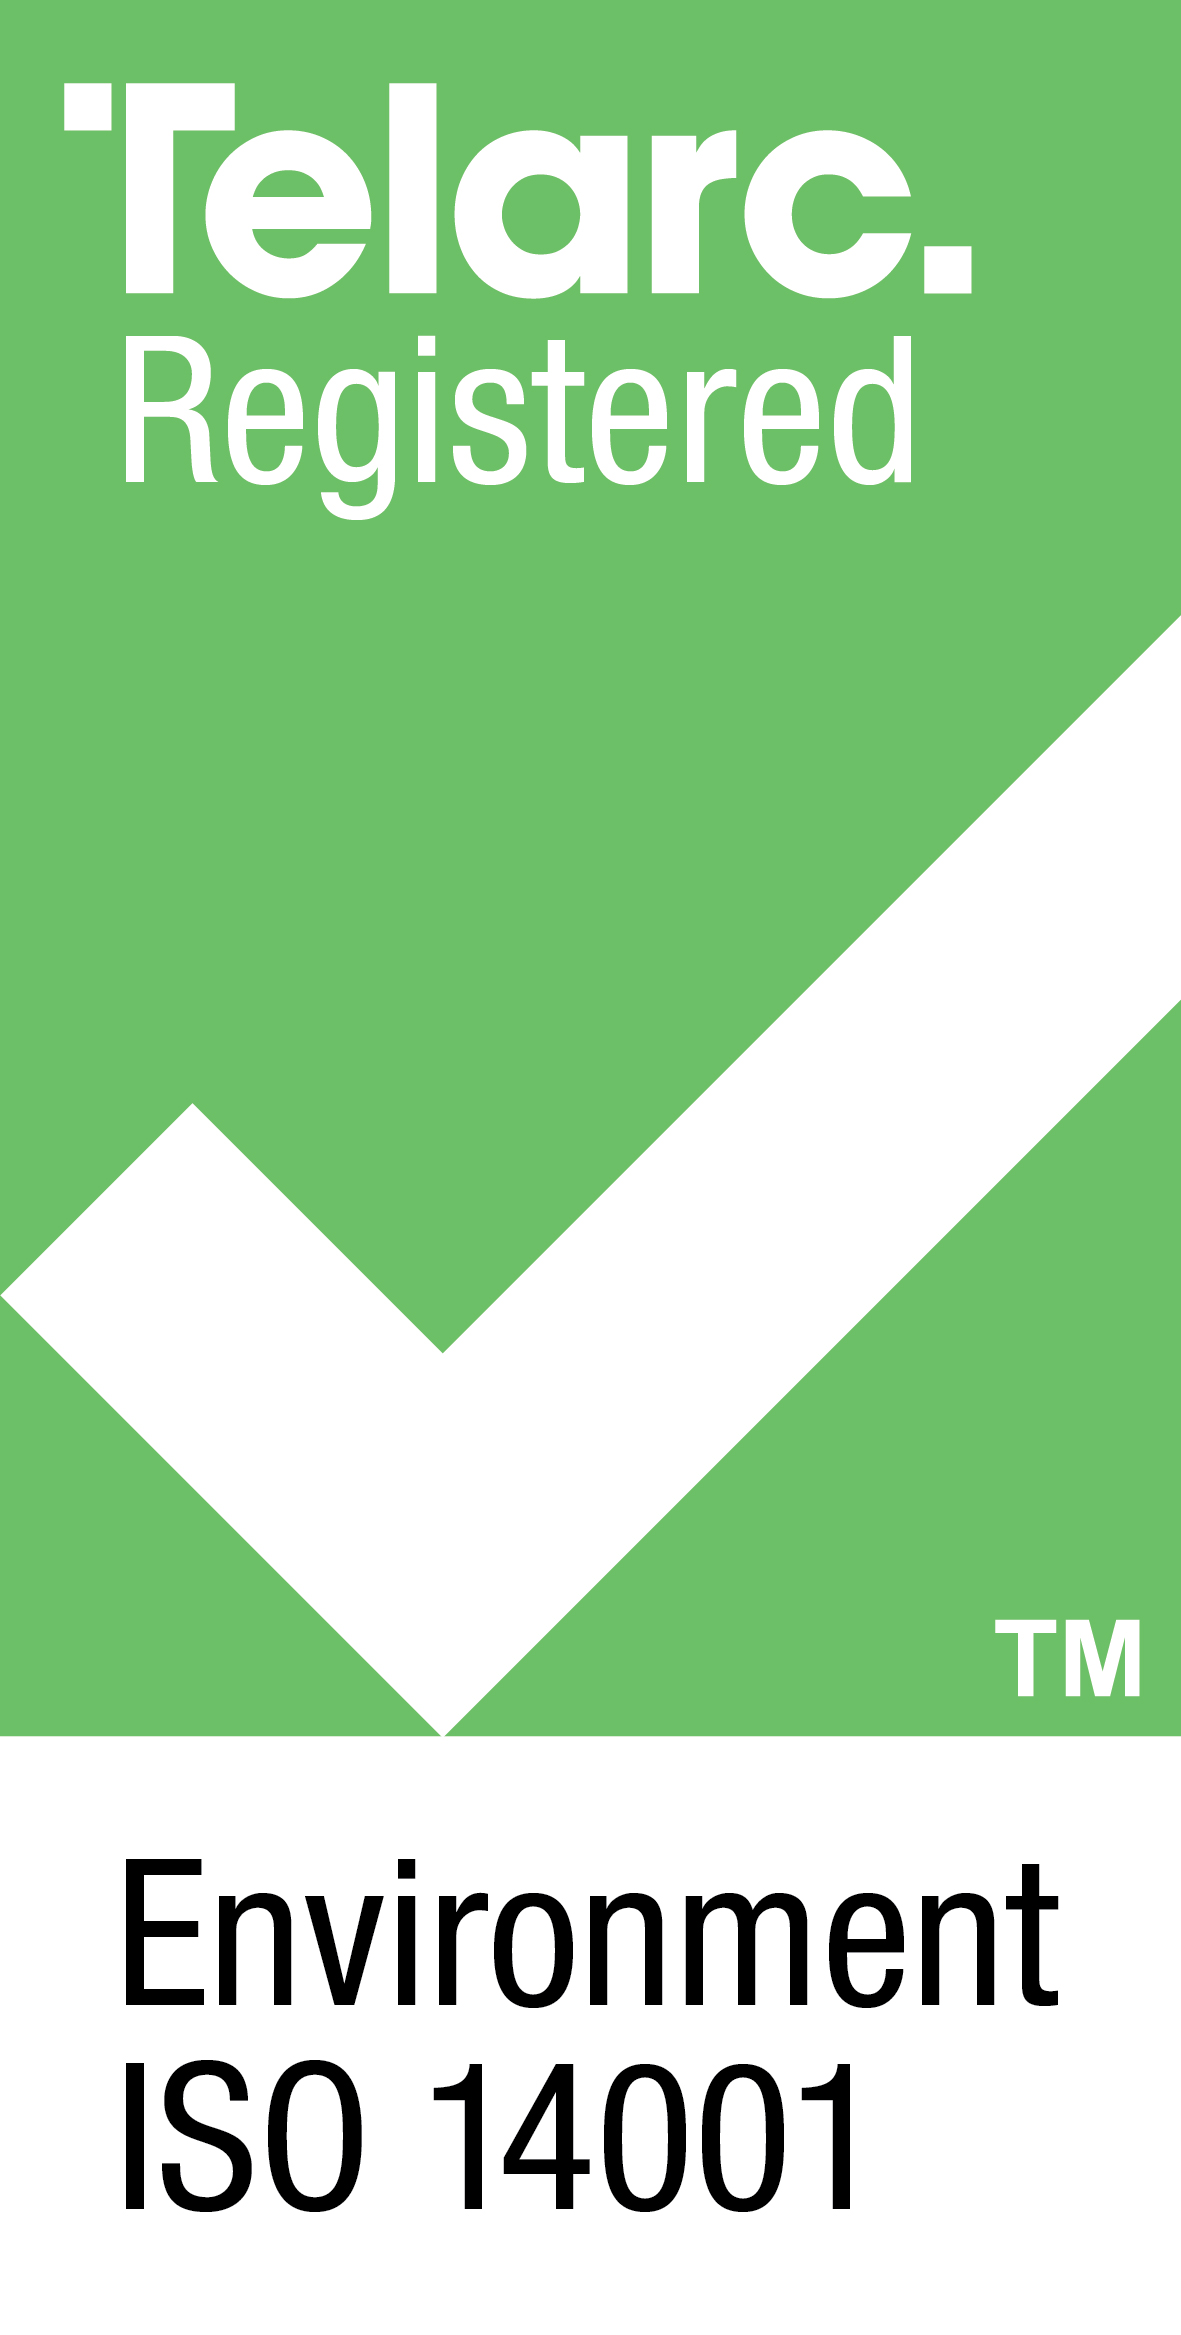 Telarc-Registration-Marks-ENVIRONMENT-ISO-14001-2015